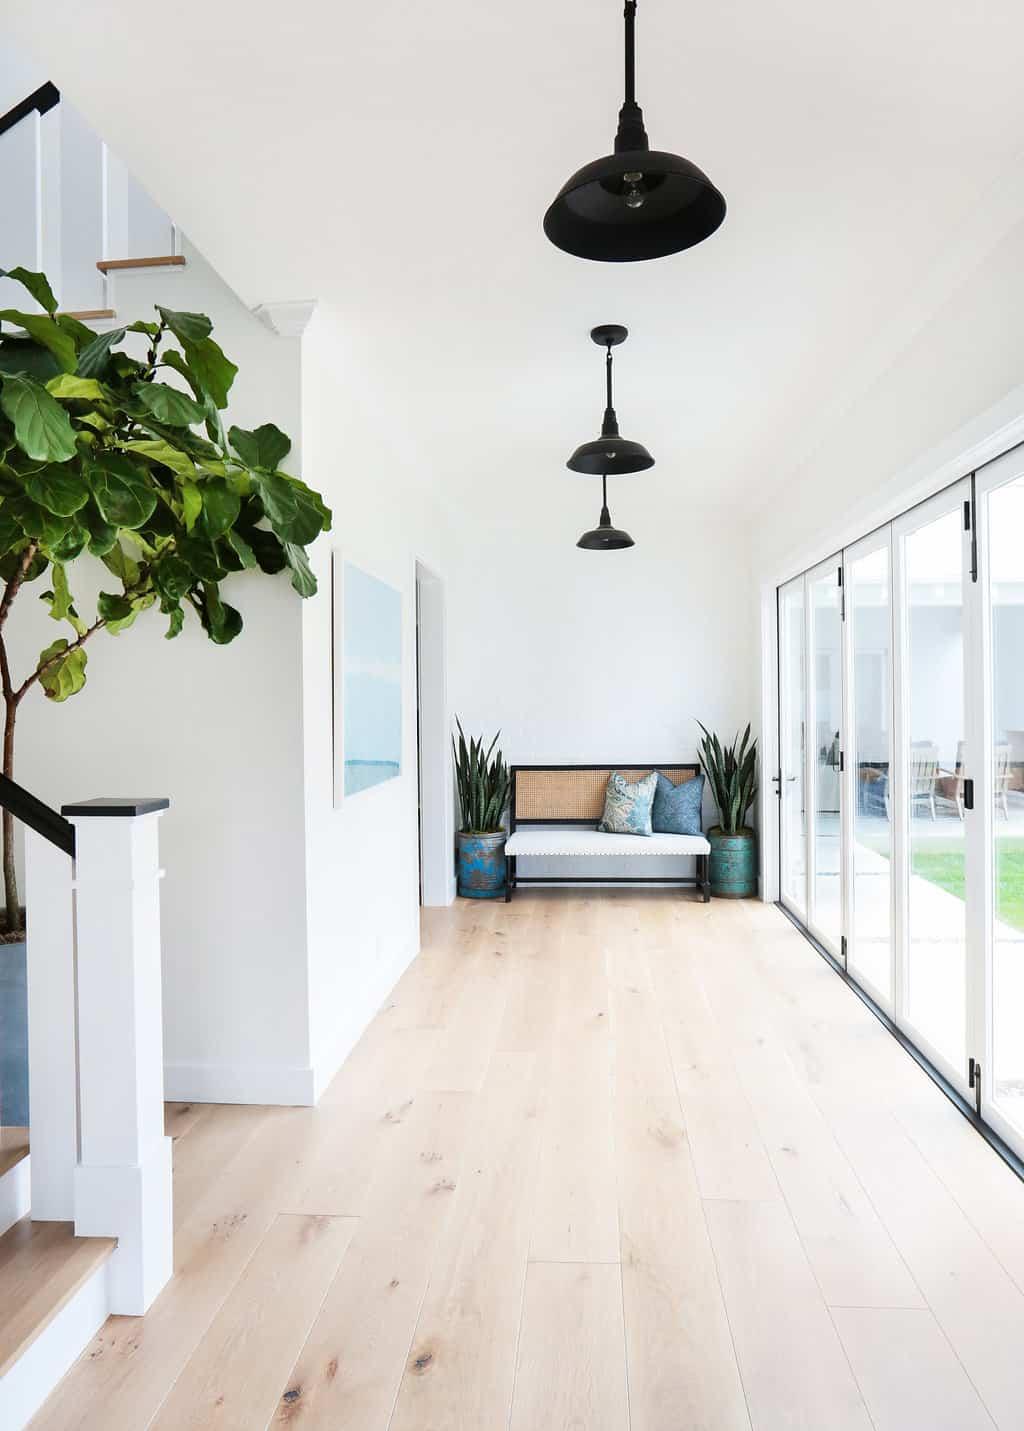 HOM-Modern-Farmhouse-With-Coastal-Flare-by-Blackband-Design-landing